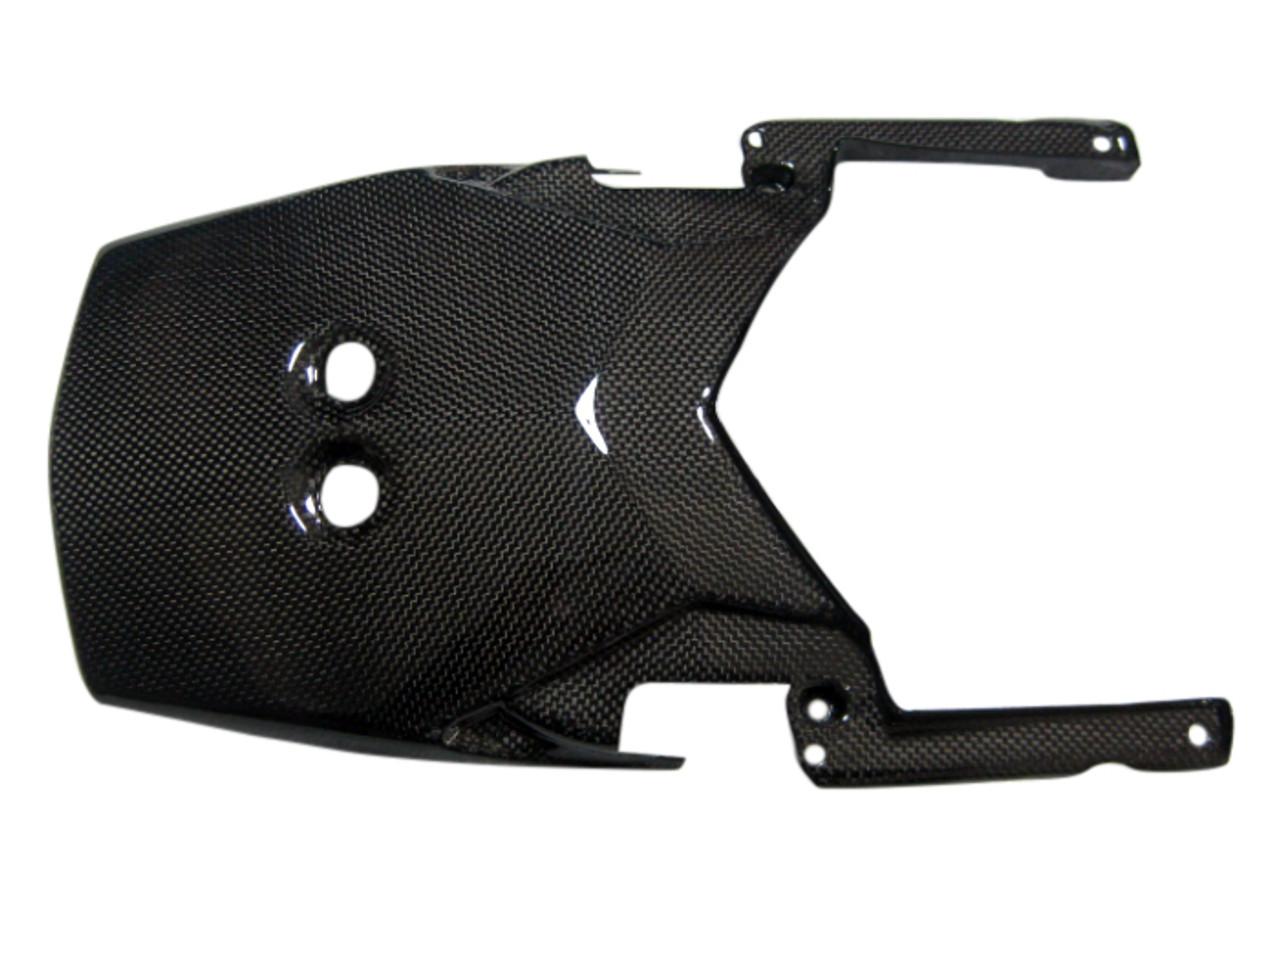 Undertray in Glossy Plain Weave Carbon Fiber for KTM Supermoto 990 SMR, ST,SE 2008-2013